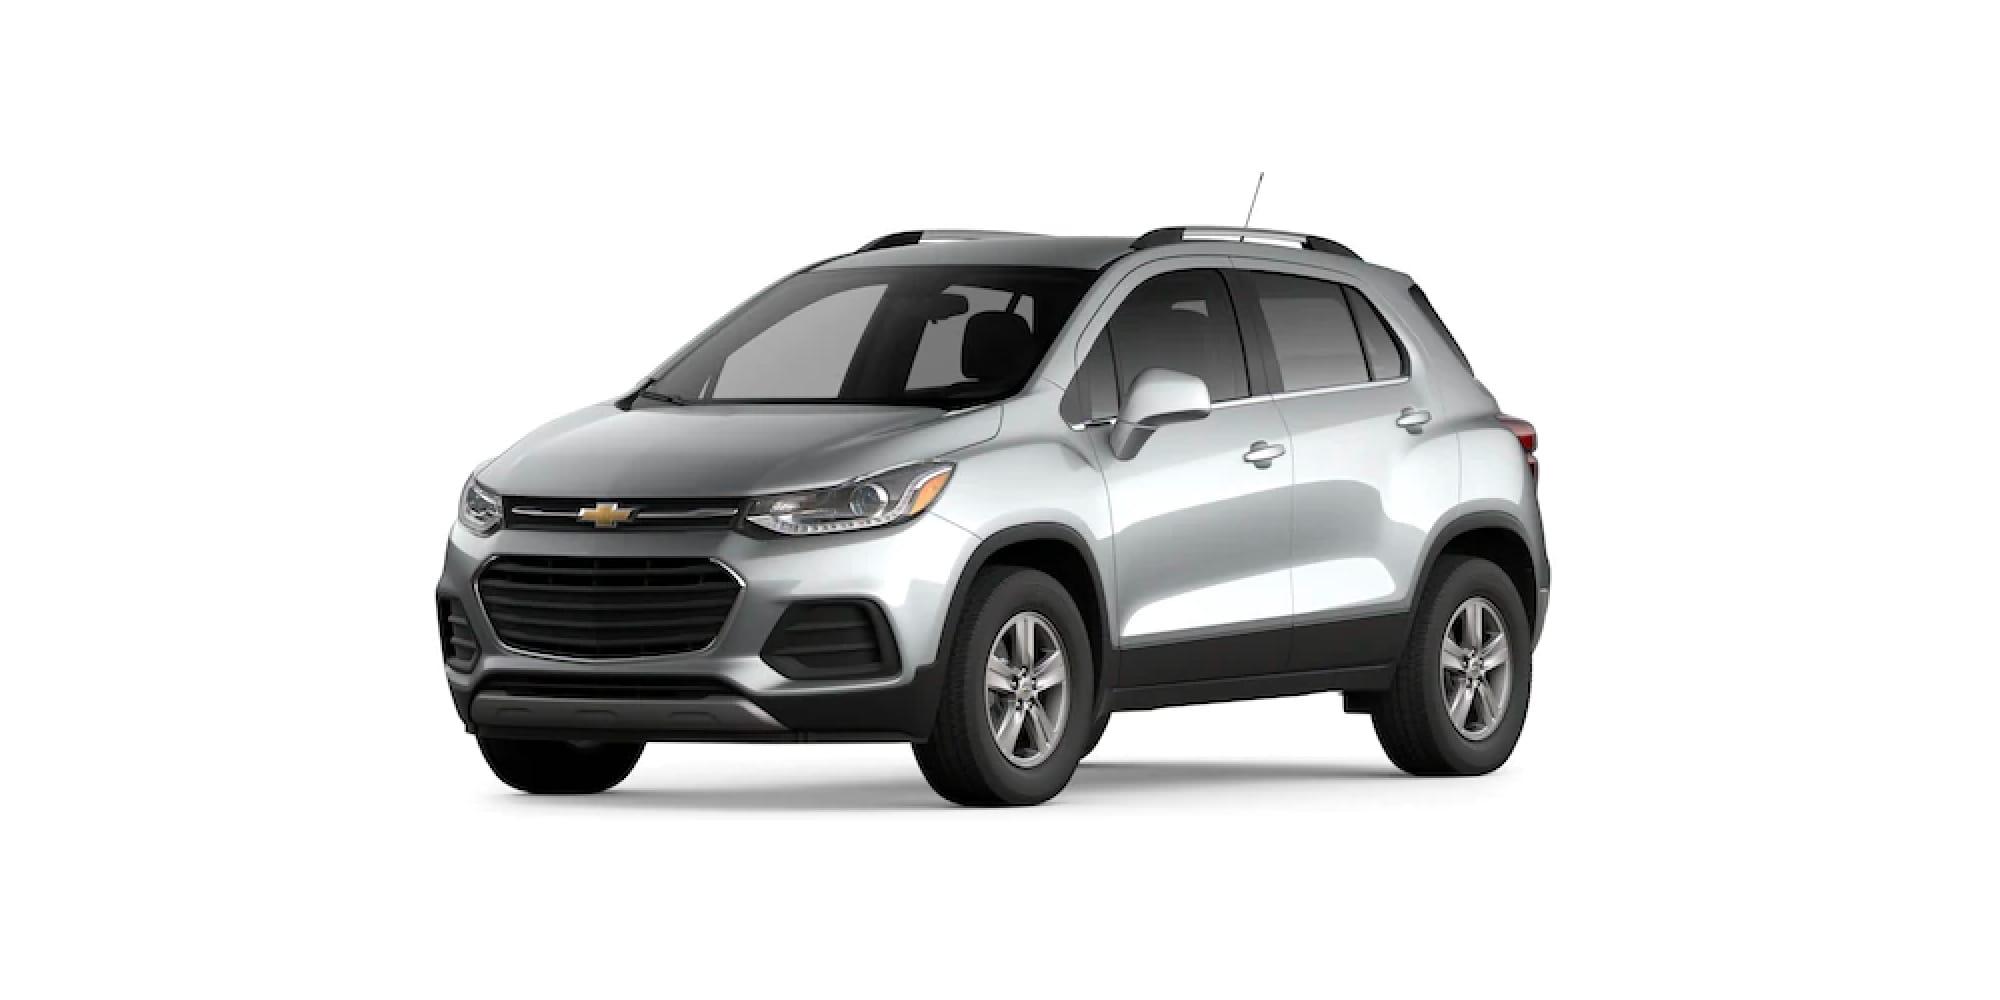 2022 Chevrolet Trax in Silver Ice Metallic